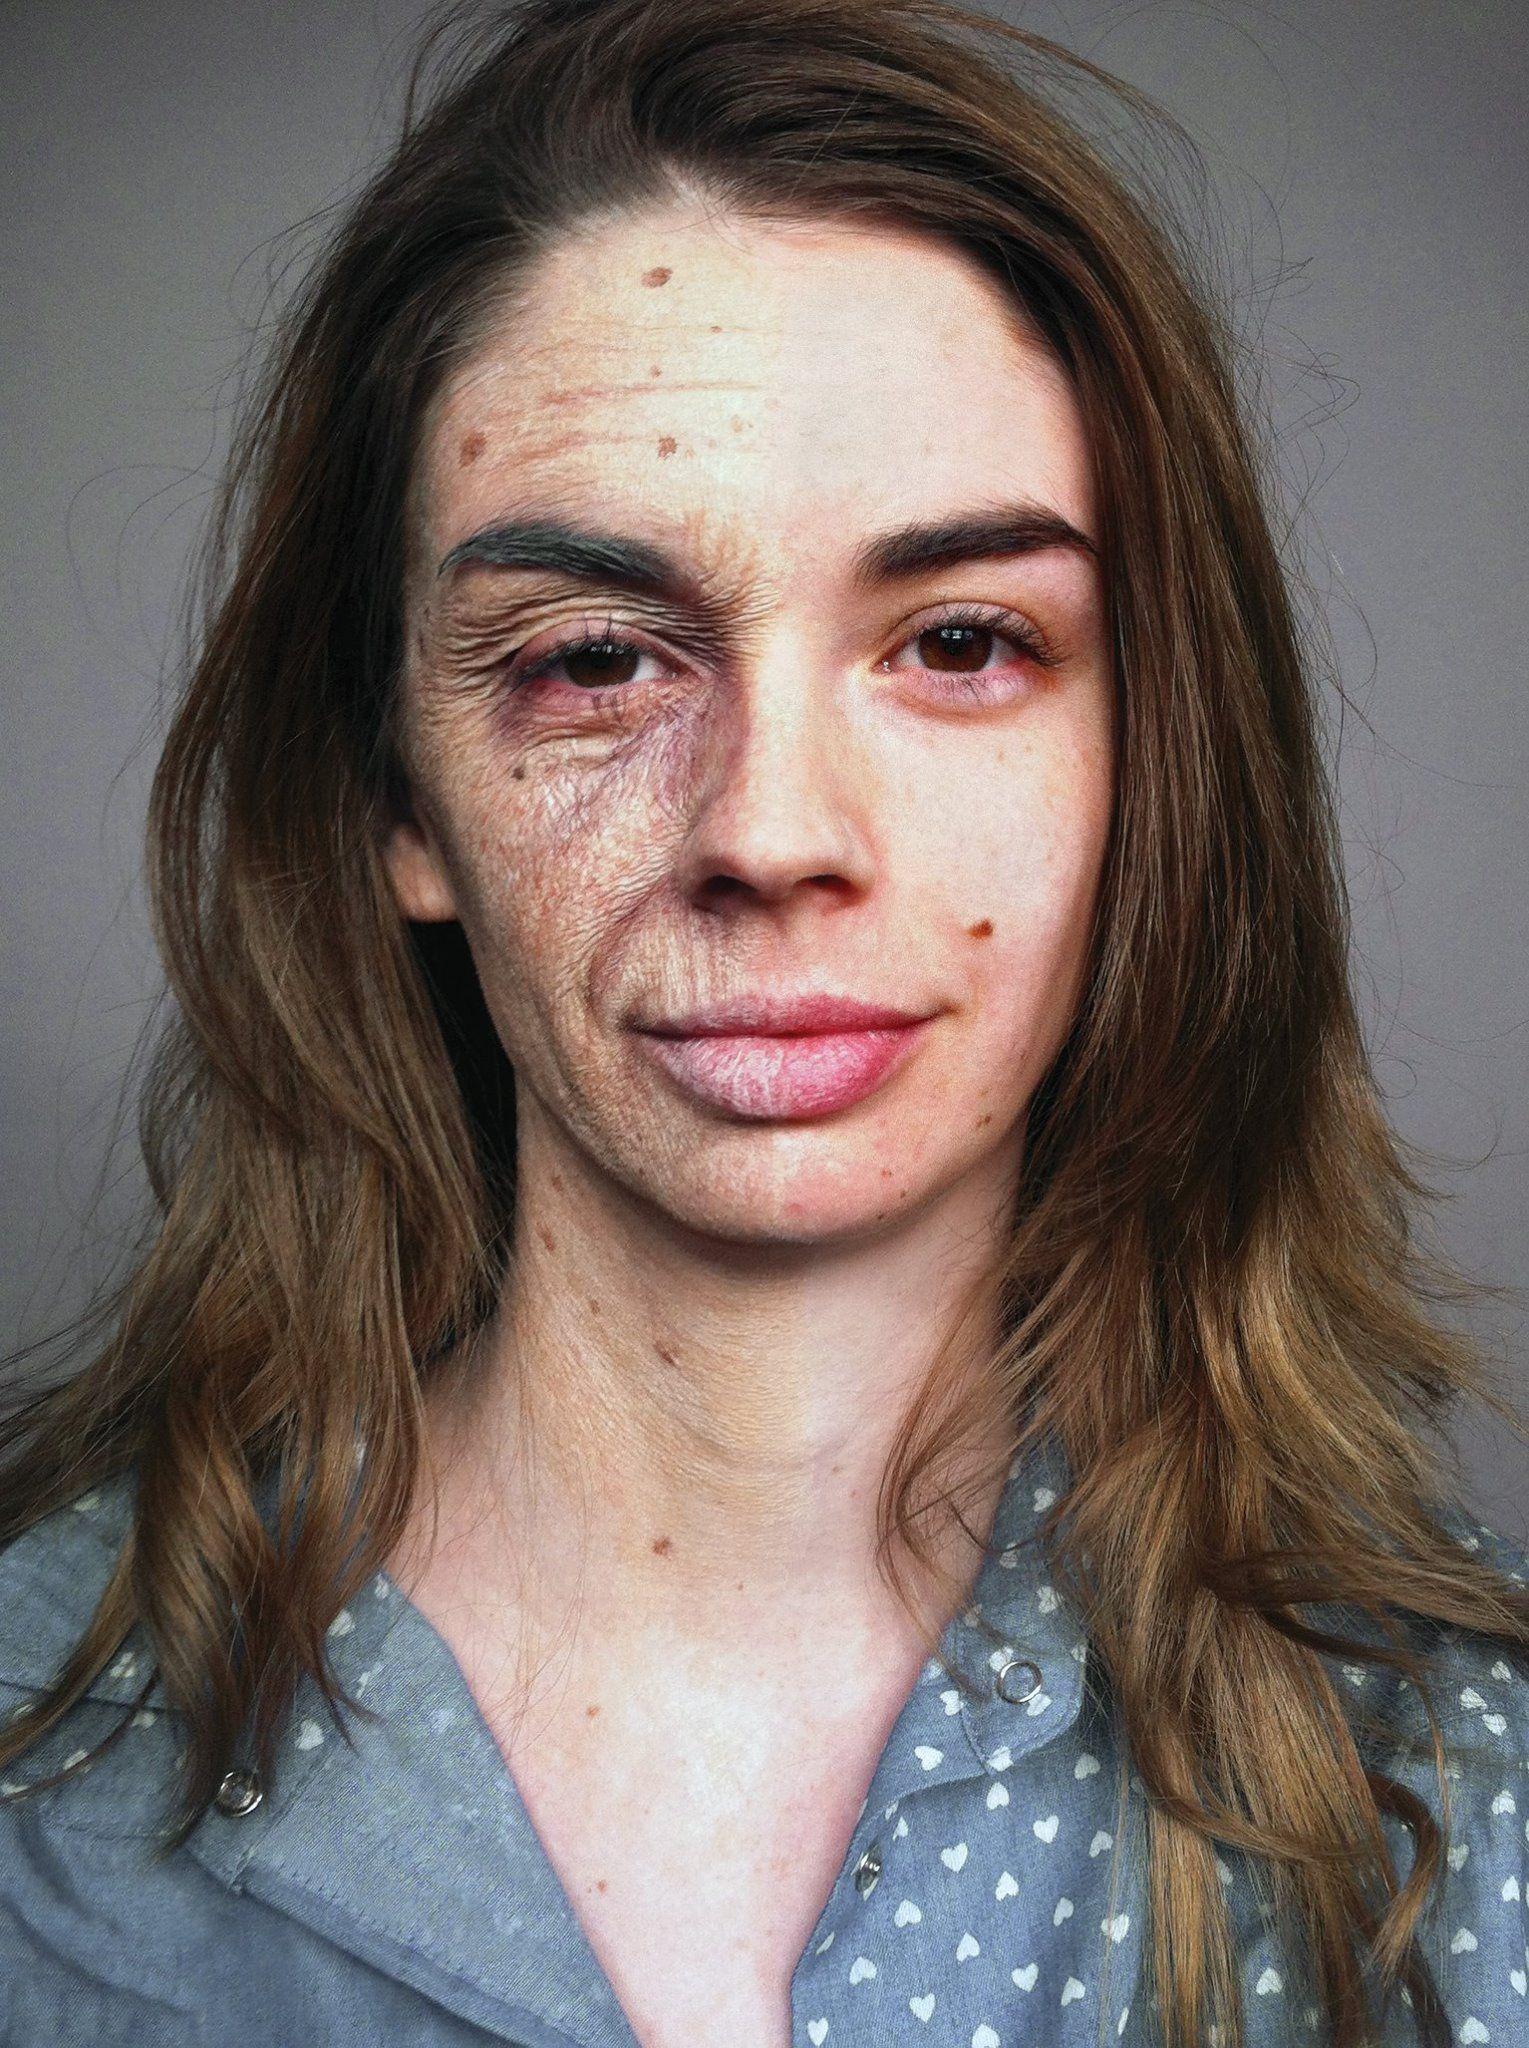 Stretchandstipple technique by FX makeup master Joel